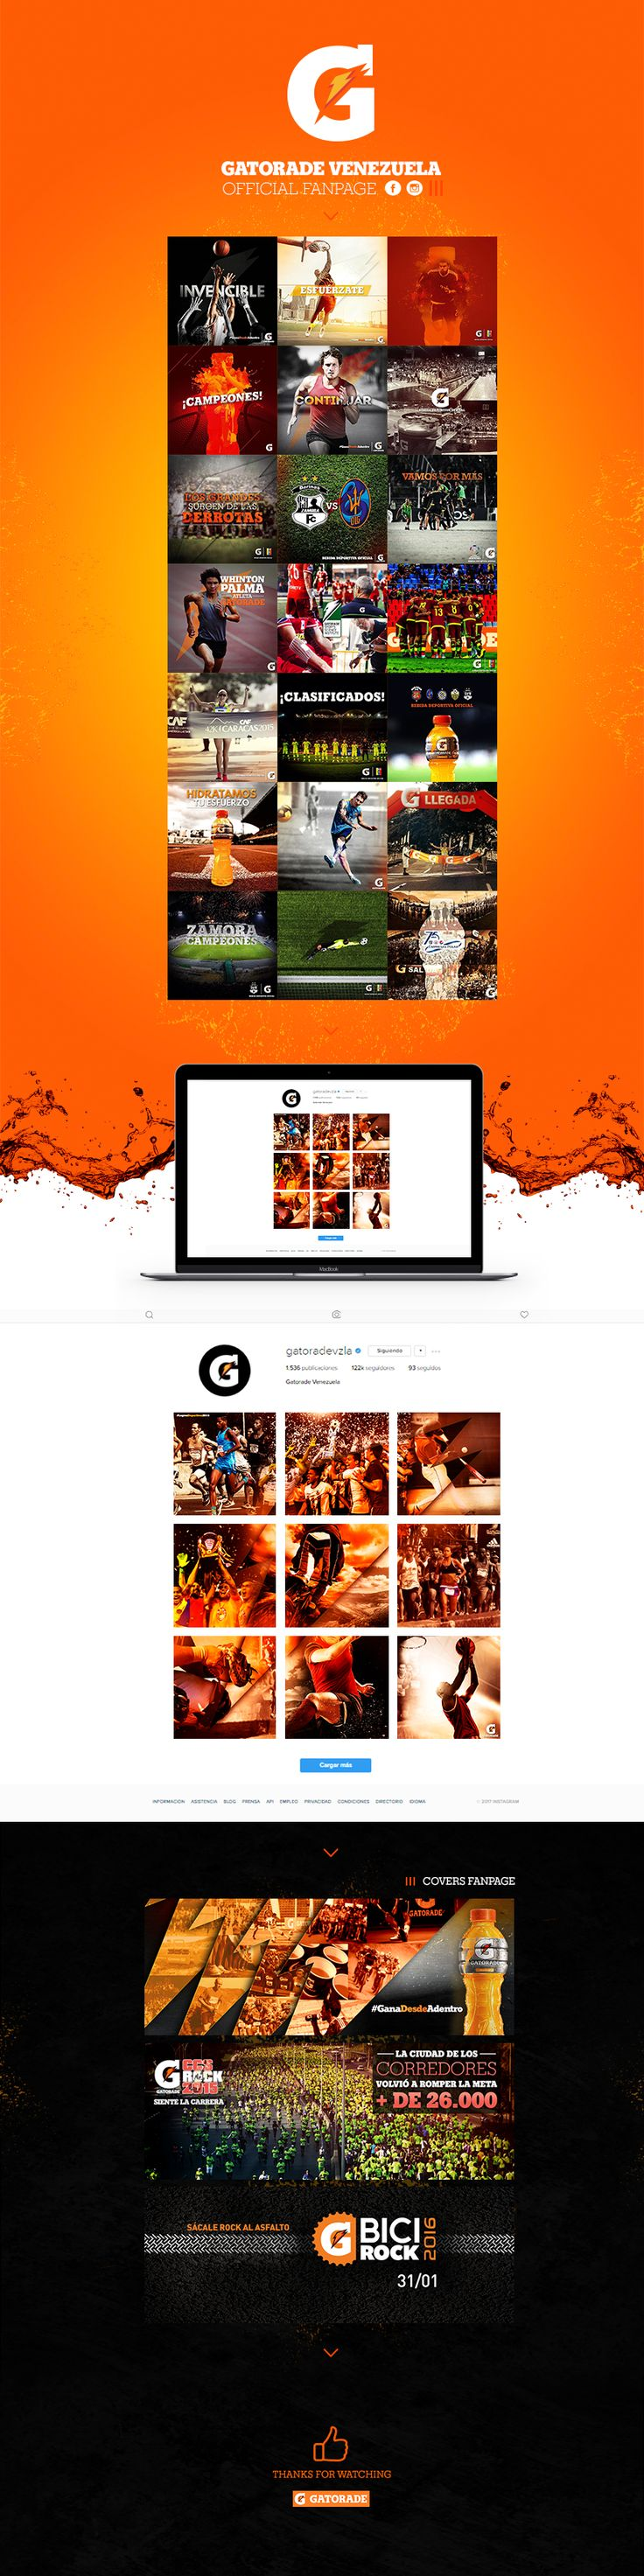 Confira este projeto do @Behance: u201cGatorade Venezuela - Mashup Interactive Agencyu201d https://www.behance.net/gallery/48957725/Gatorade-Venezuela-Mashup-Interactive-Agency